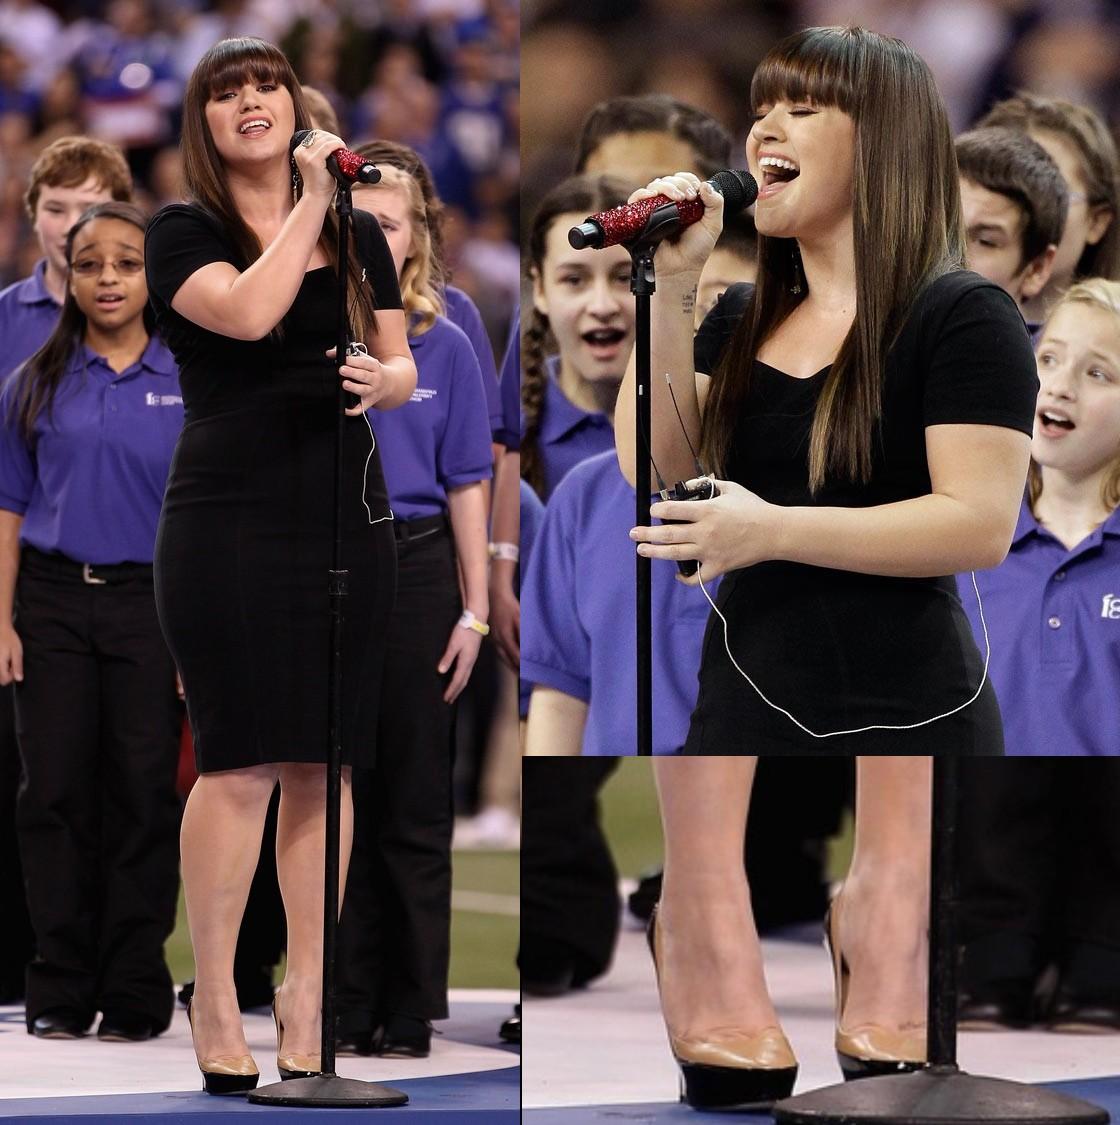 http://3.bp.blogspot.com/-sNGTjJqnNoE/Ty-HlSXRy_I/AAAAAAAAAR0/IONdFrqNqDA/s1600/kelly-clarkson-national-anthem-012.jpg